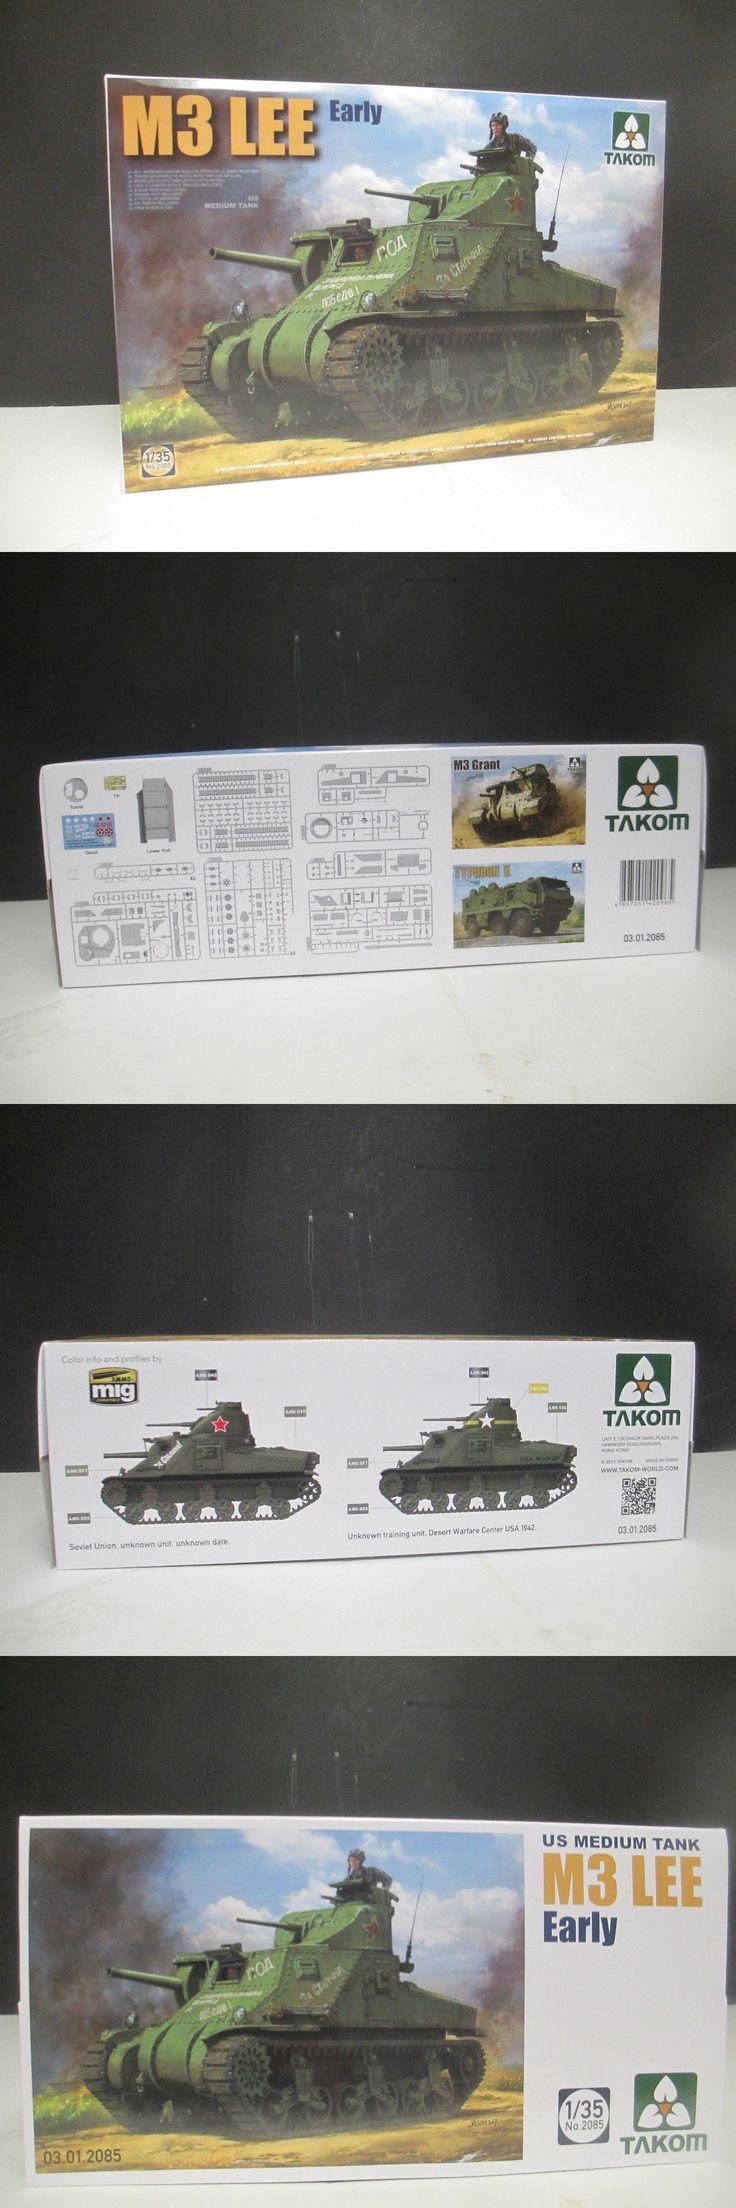 Armor 2588: Takom Models 2085 1 35 Us M3 Lee Early Medium Tank Kit -> BUY IT NOW ONLY: $53.95 on eBay!